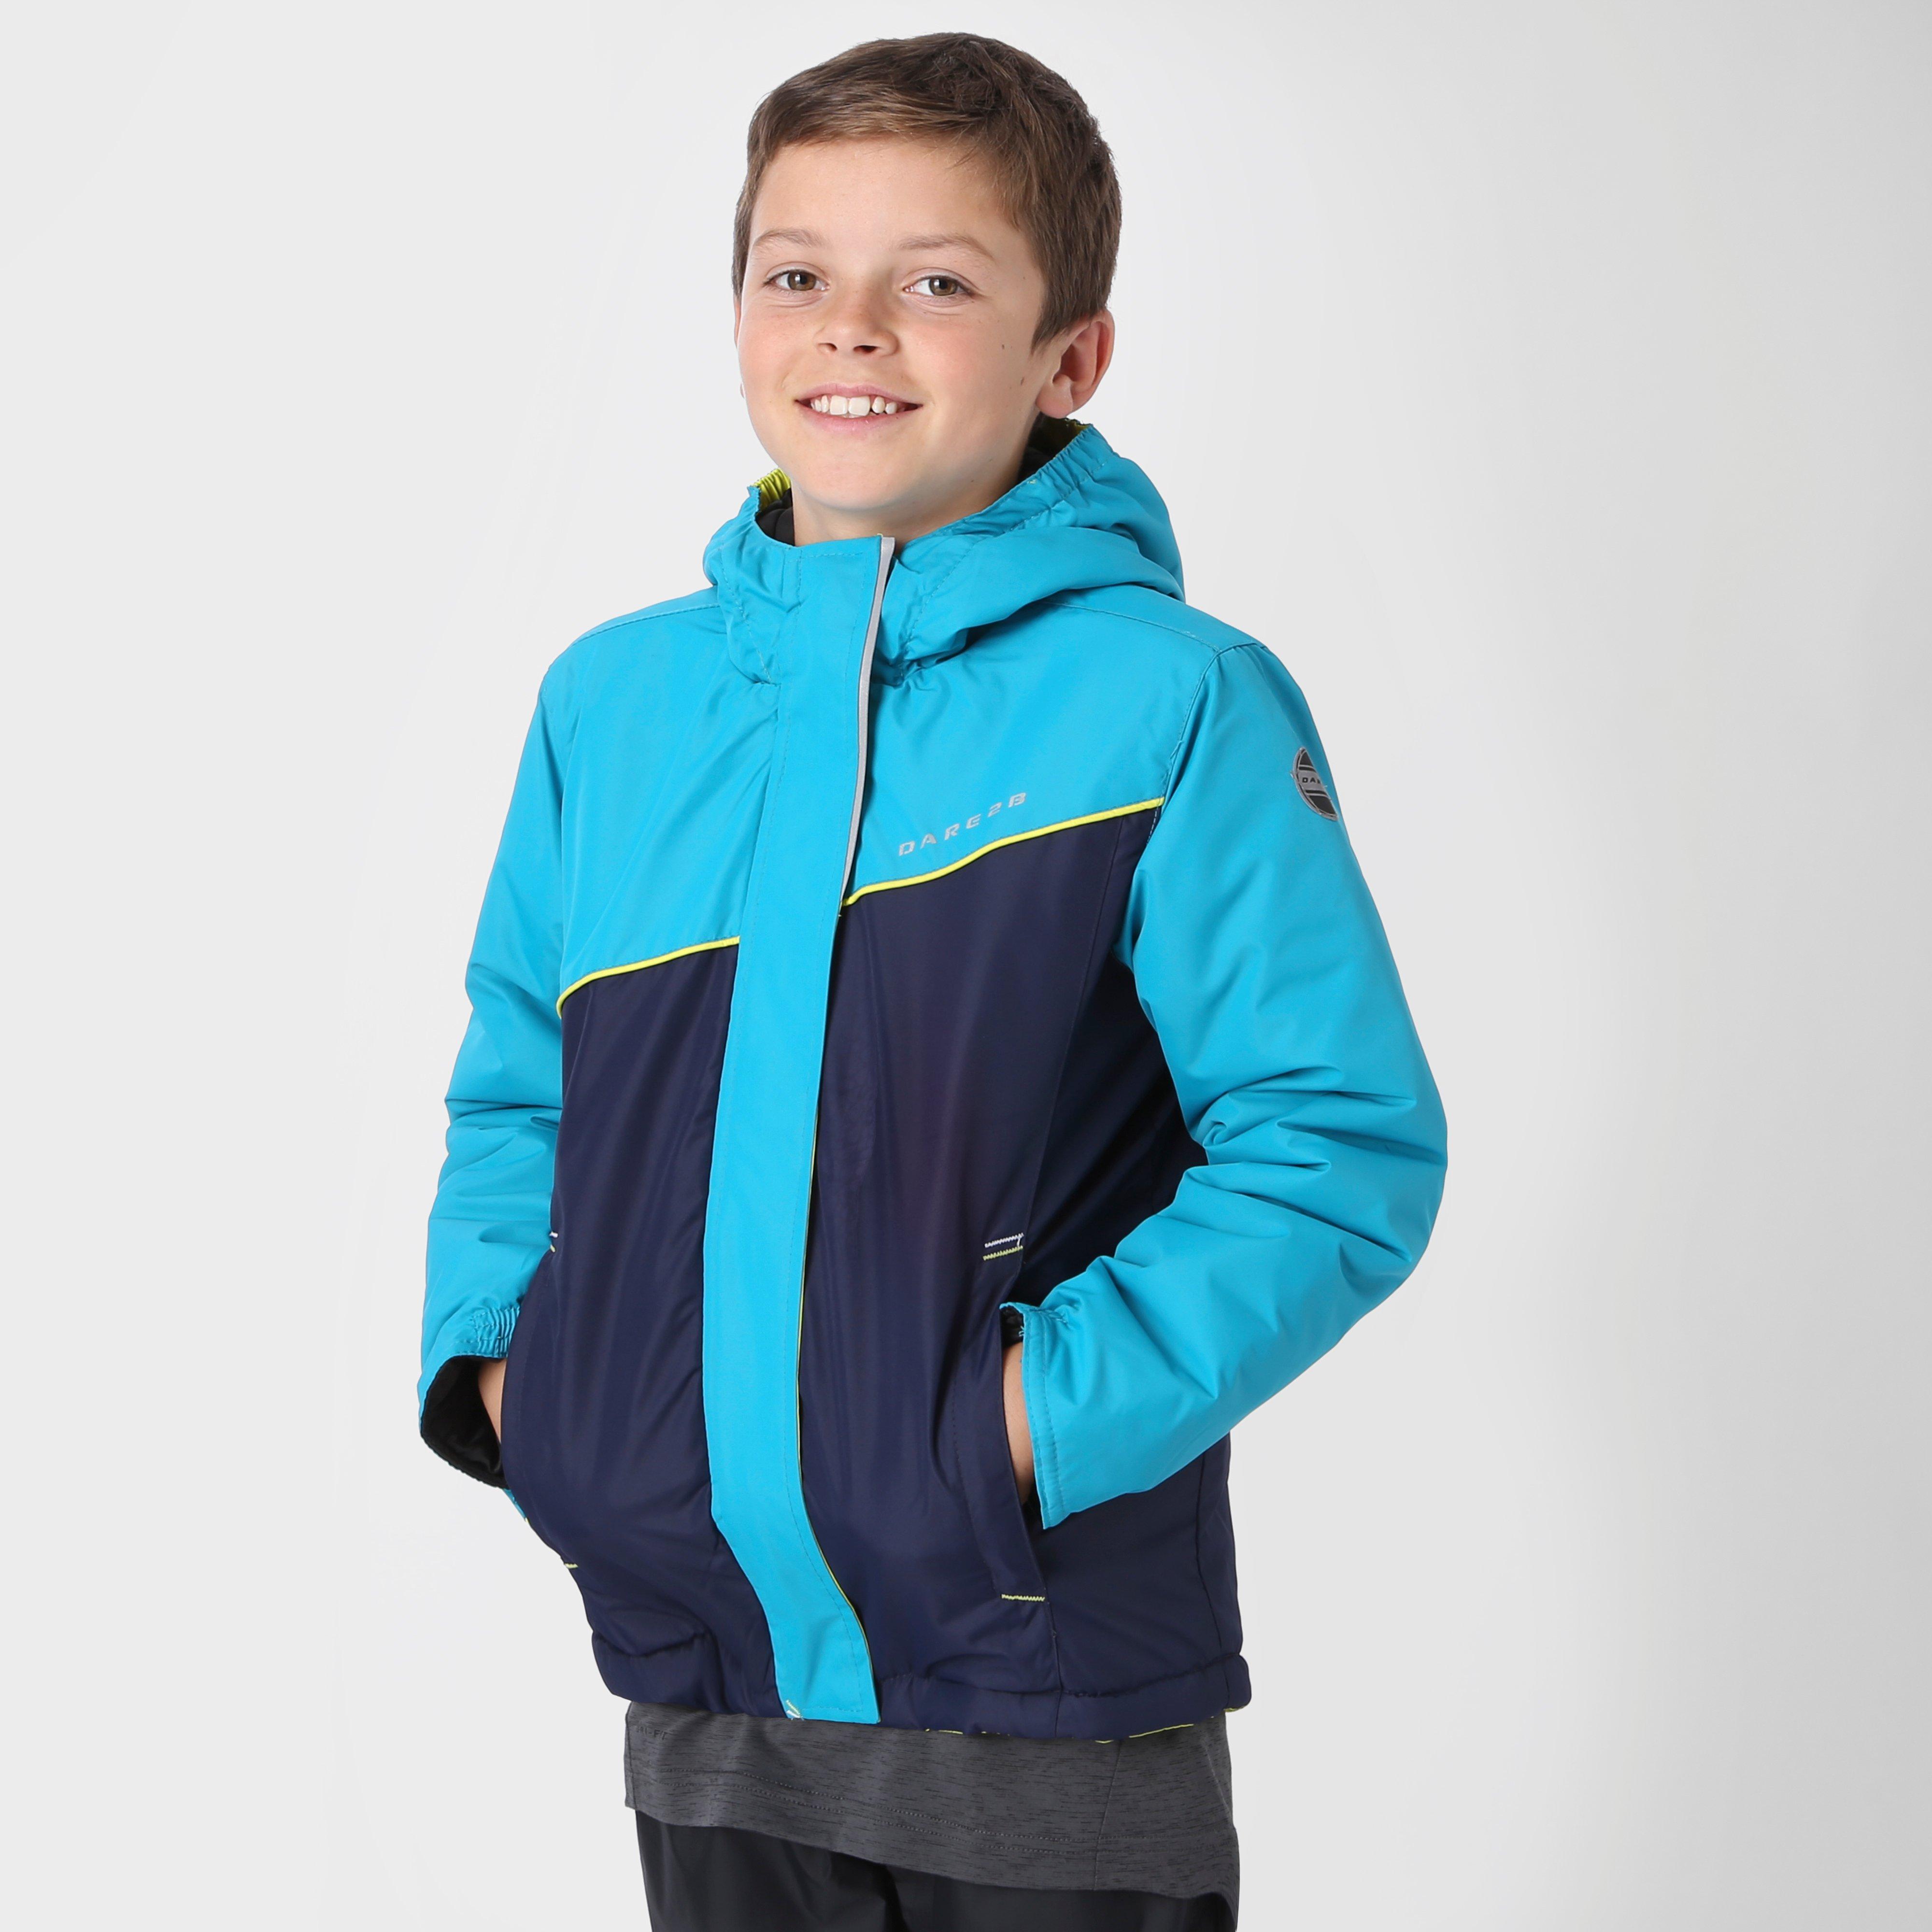 Dare 2B Boys Set About Ski Jacket Navy